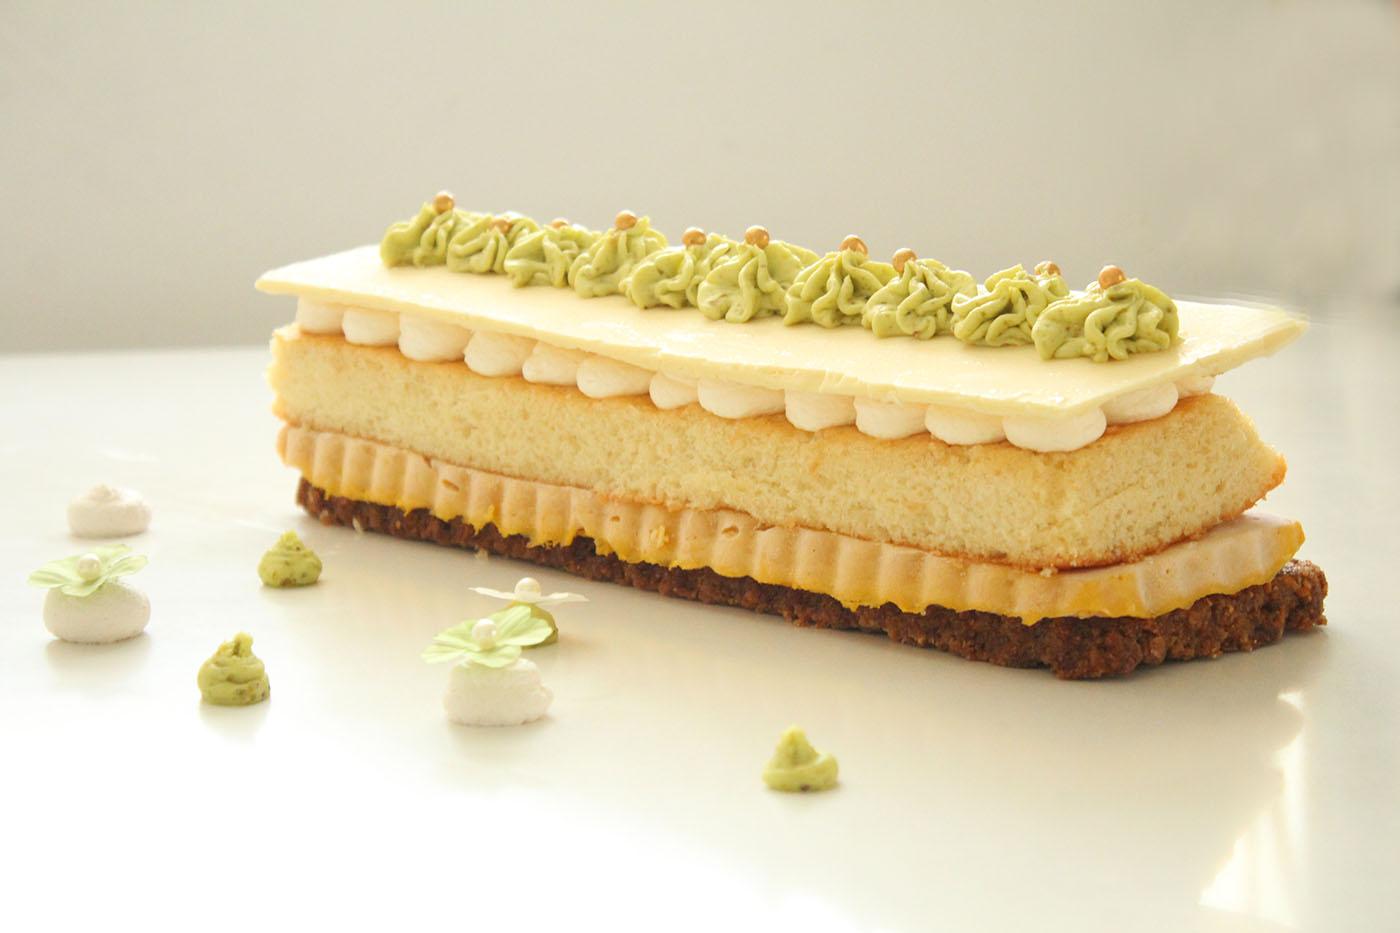 IMG 9251 - עוגת שכבות אקזותית